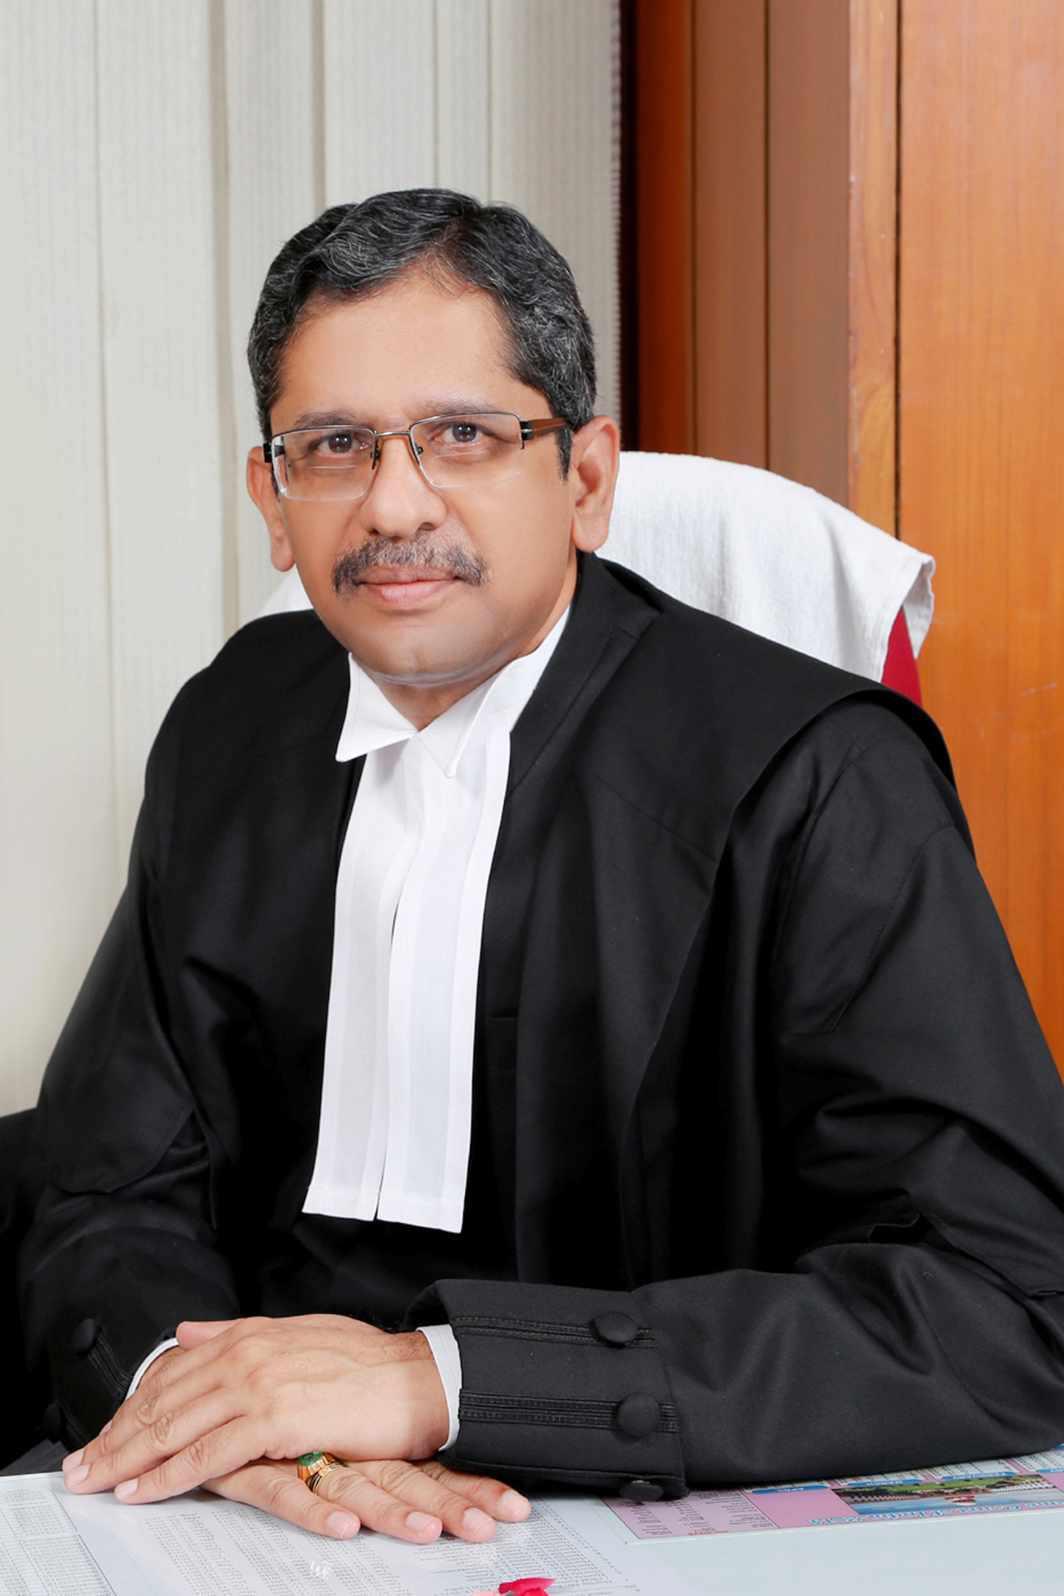 CJI bats for 50% quota for women in judiciary